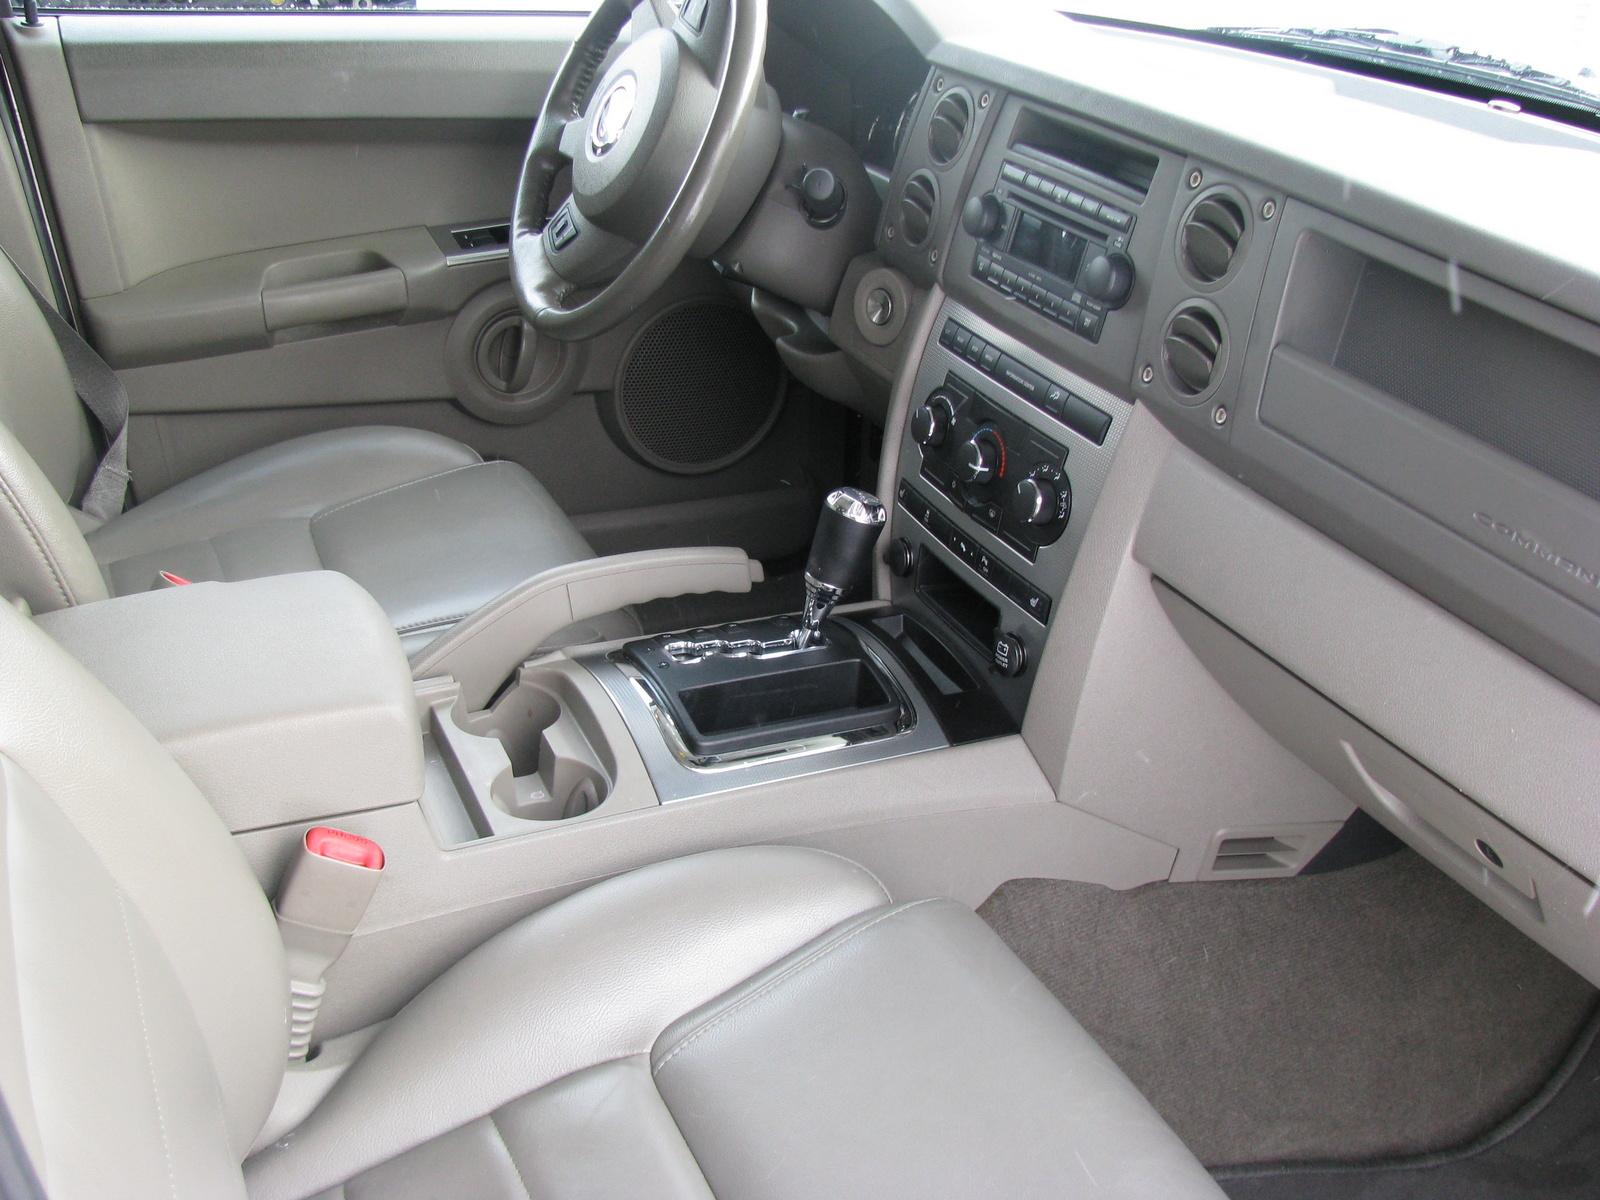 2007 jeep commander pictures cargurus